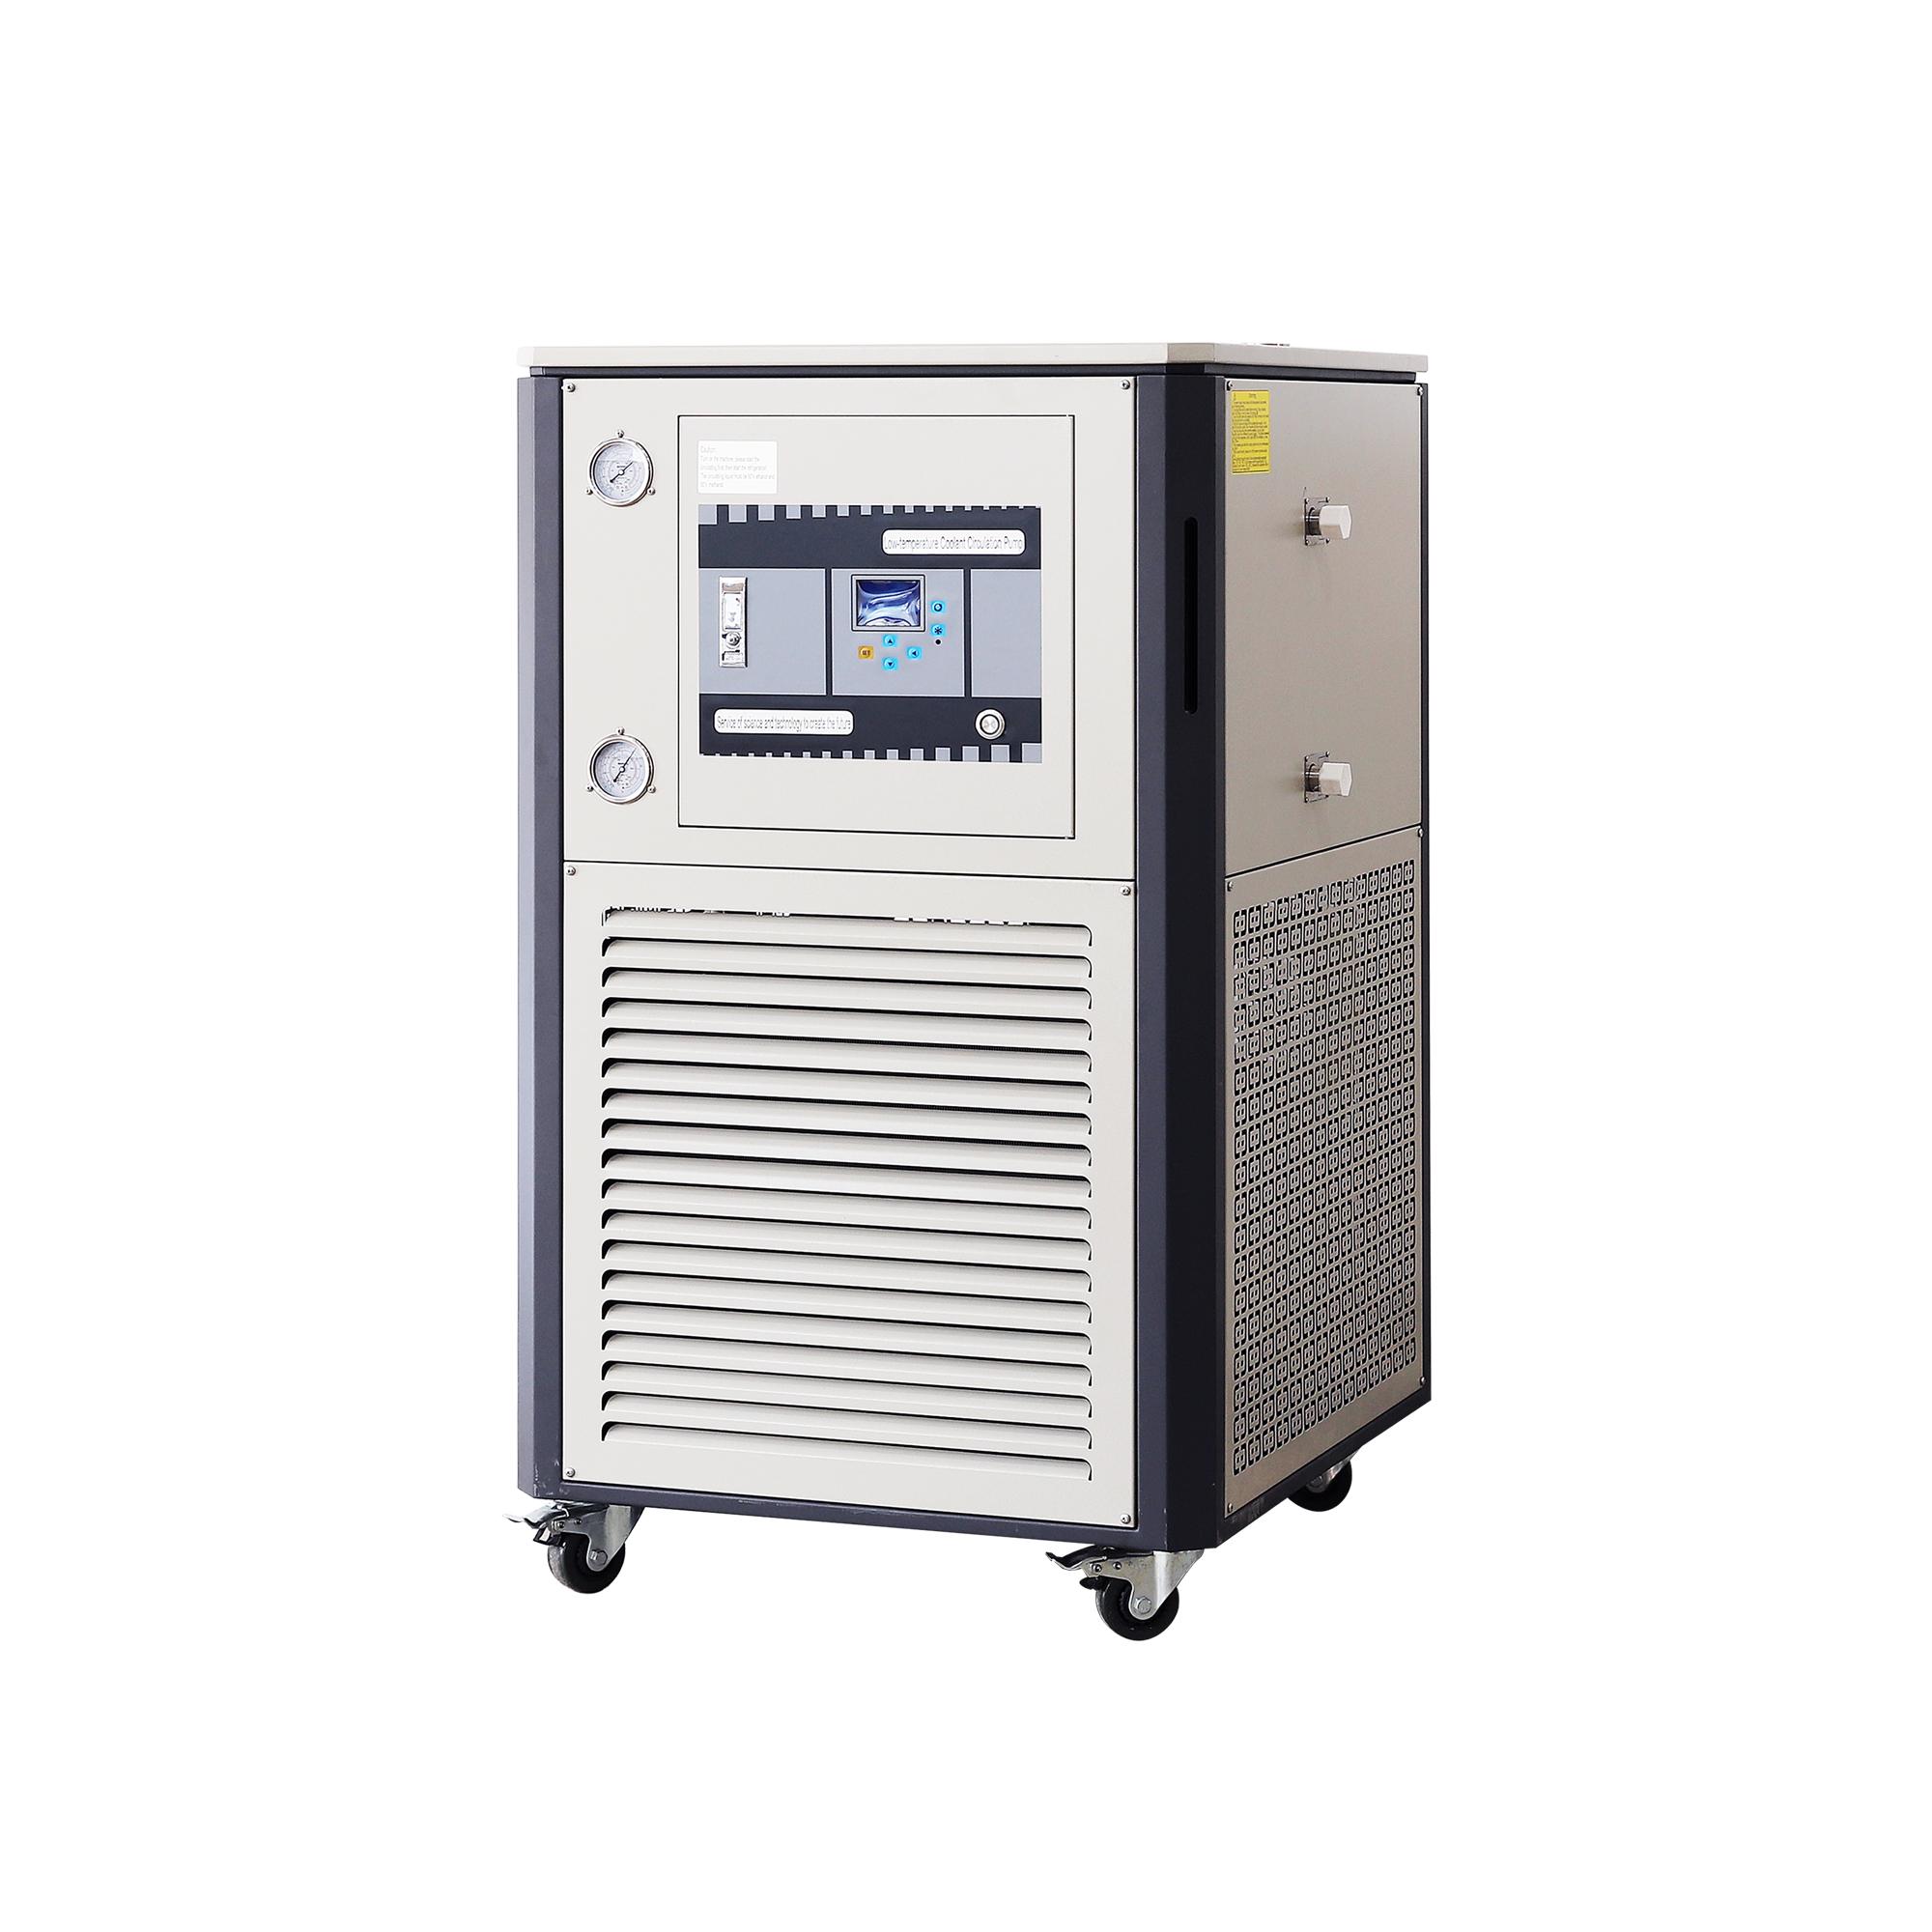 DLH-80-30L